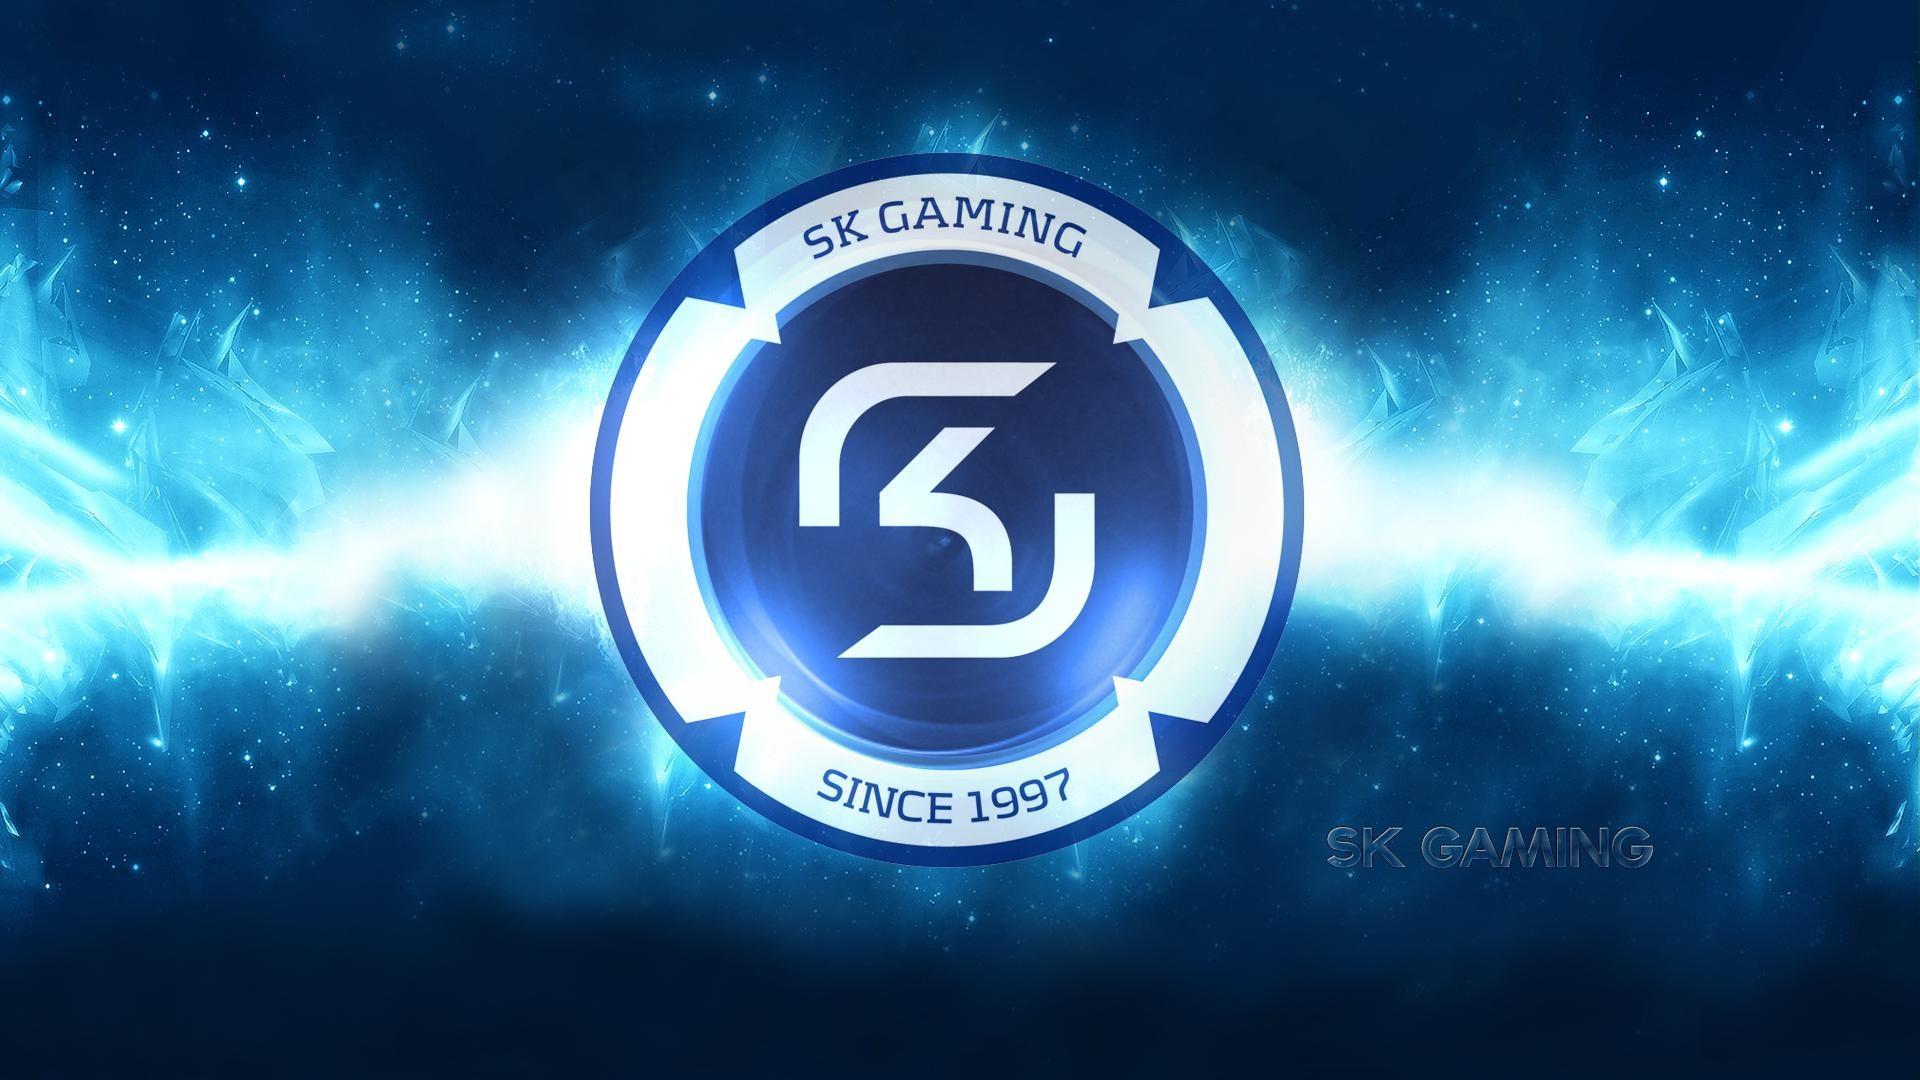 sk-gaming-league-of-legends-team-wallpaper (1)